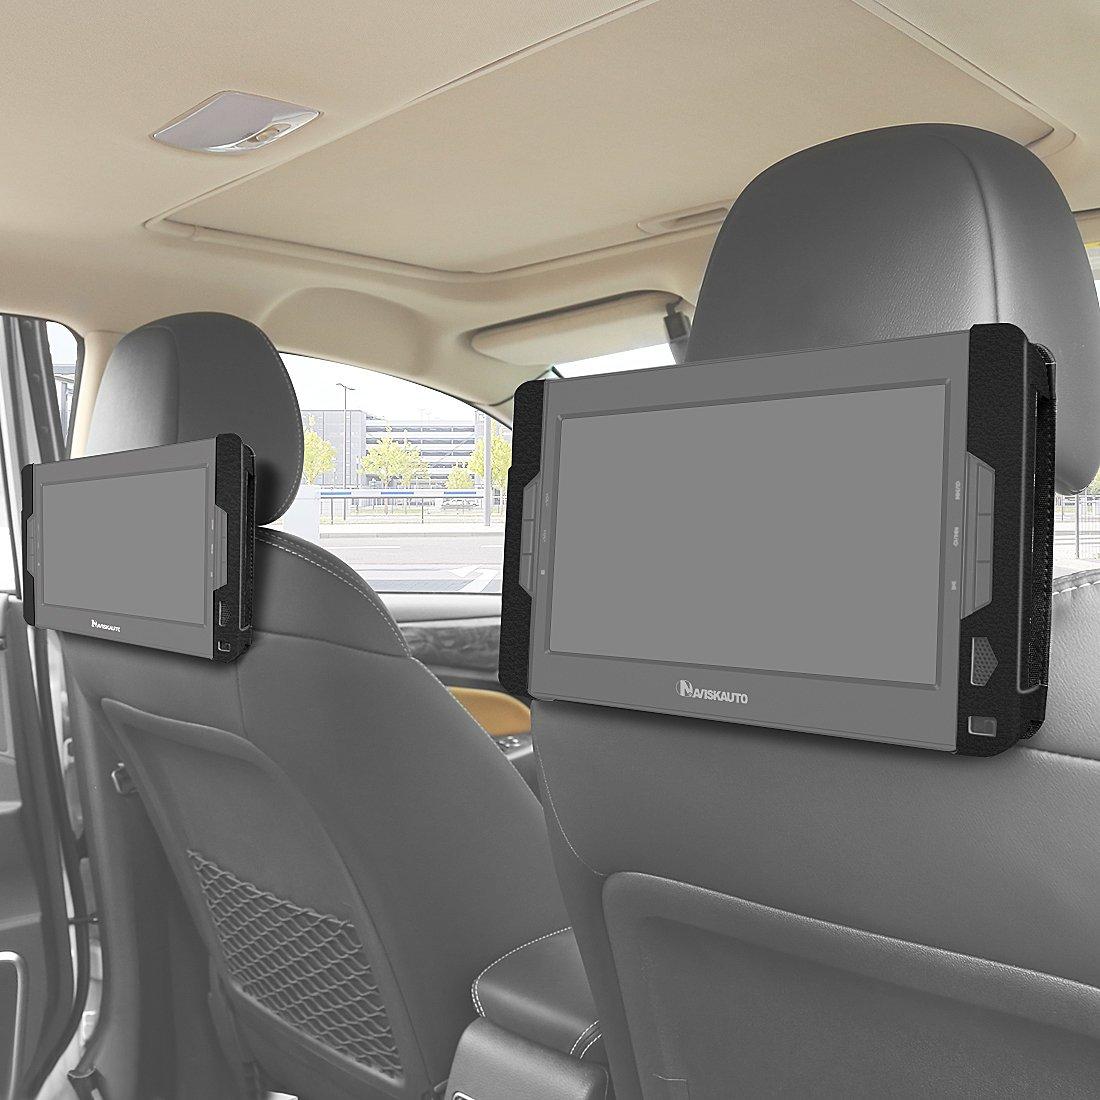 NAVISKAUTO Dual Car Headrest Mount Holder Bracket Only for NAVISKAUTO 10.1 Inch Dual Screen DVD Player and Dual DVD Player